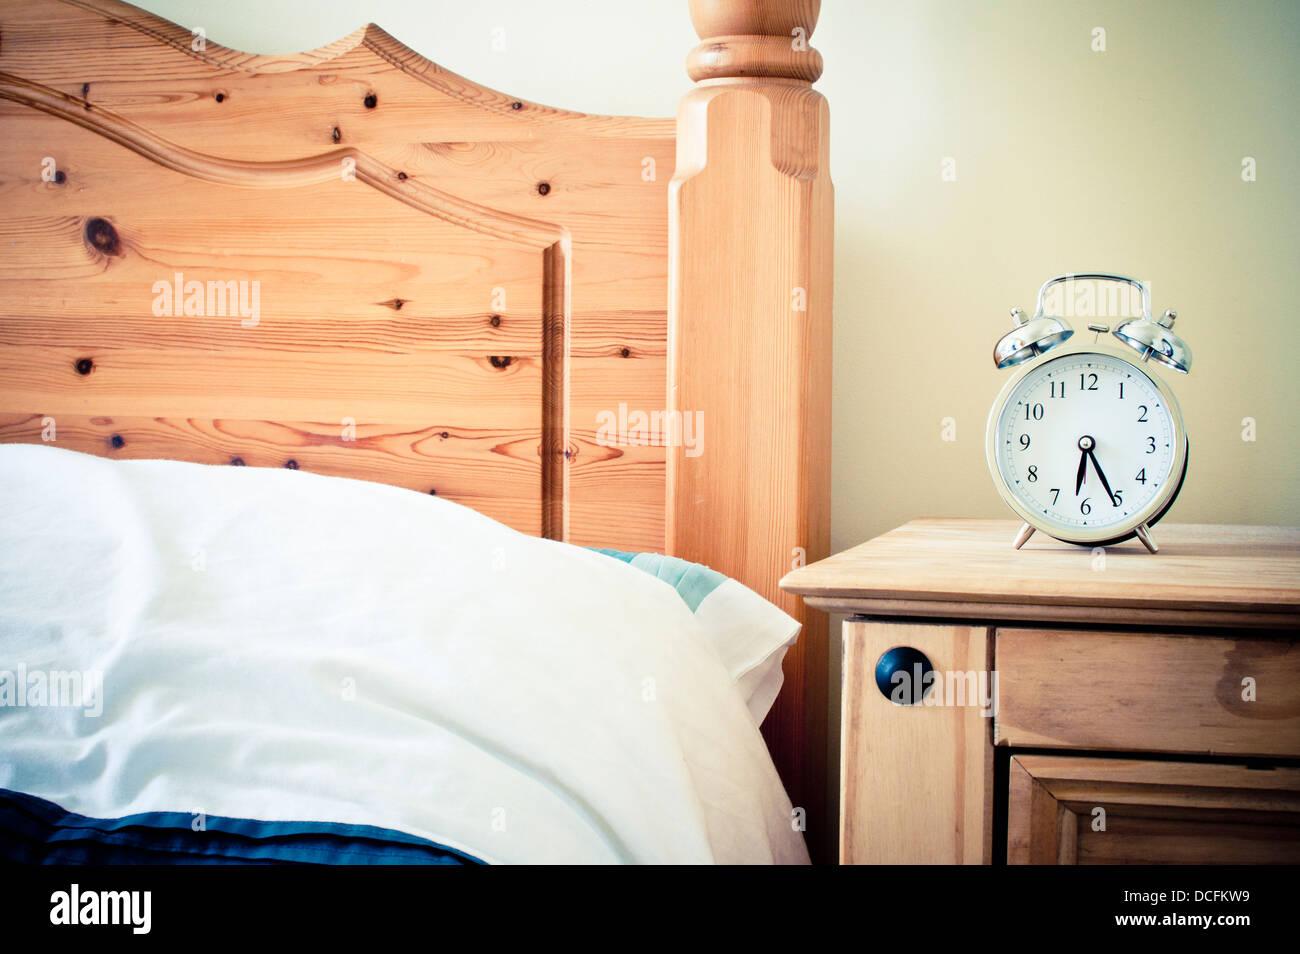 Pine bedroom furniture - Stock Image